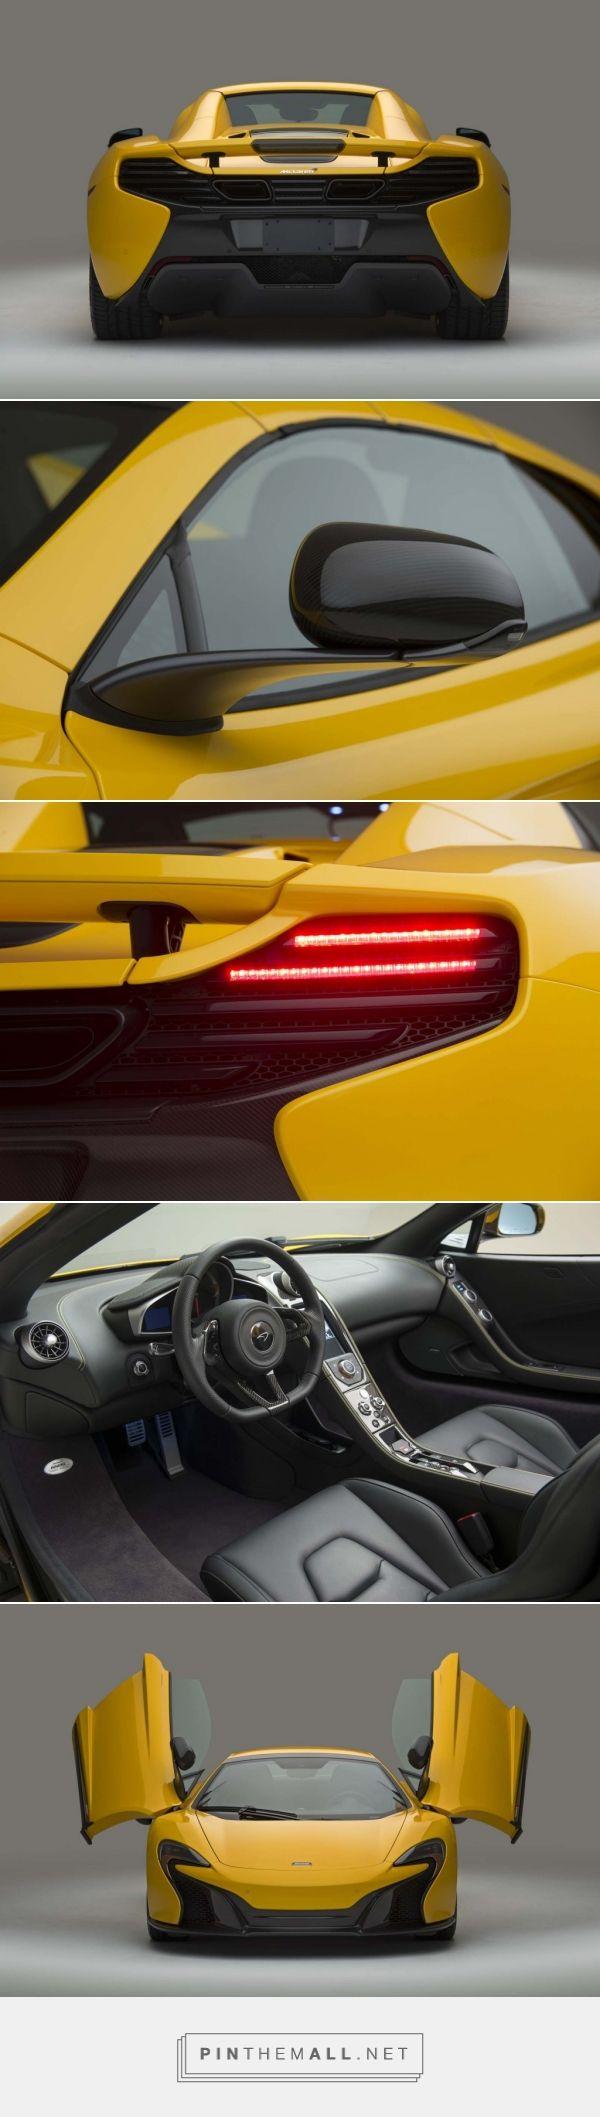 2016 McLaren 650S: More Colors, Options And Carbon Bits on CarHoots.